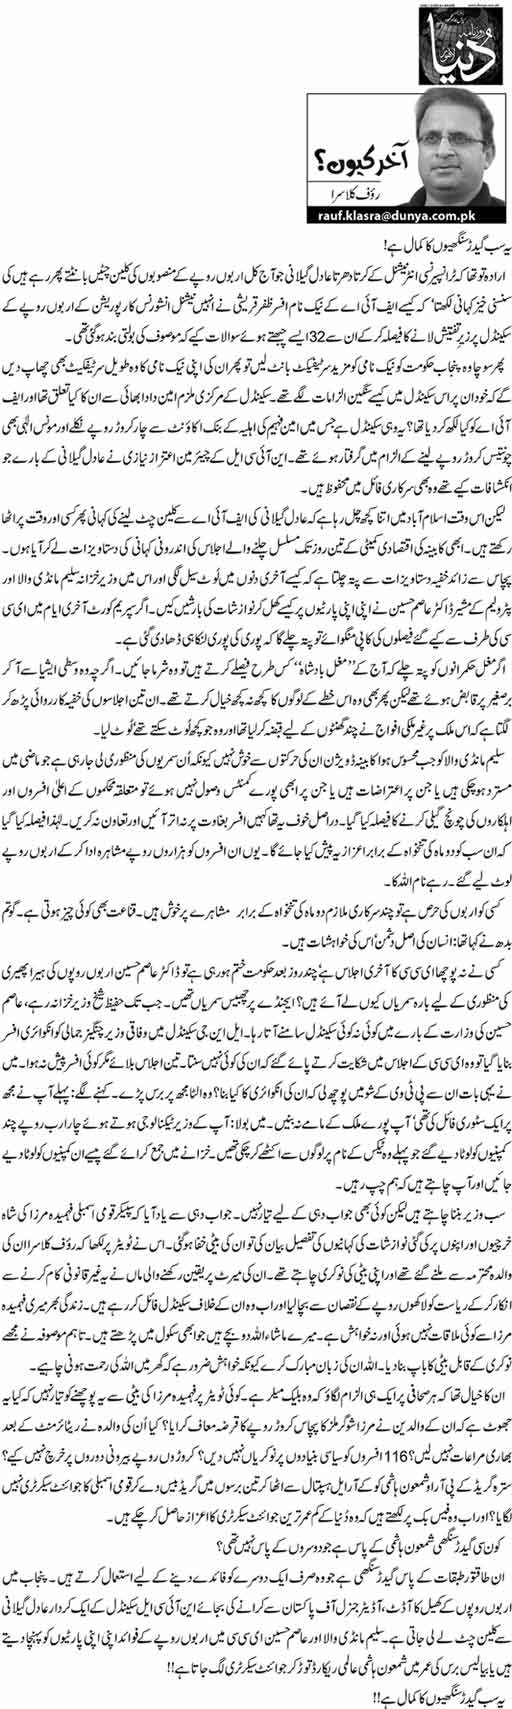 Yeh Geedar Singhiyun Ka Kamaal Hai! - Rauf Klasra